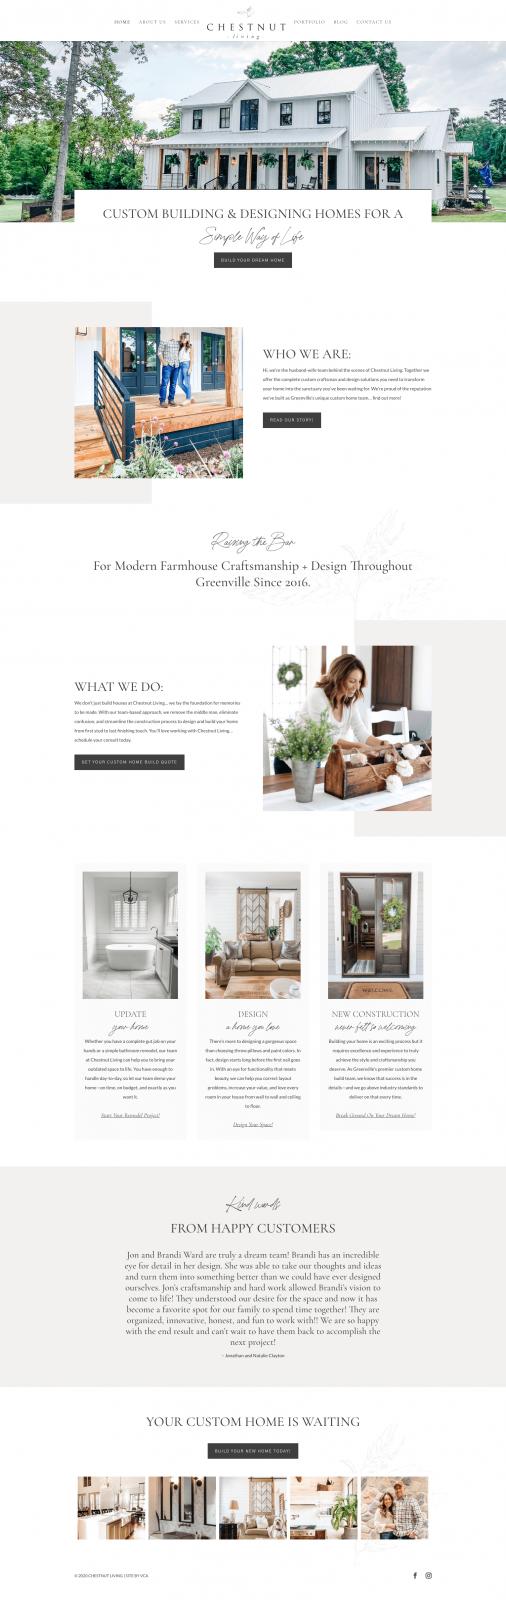 chestnut living website design